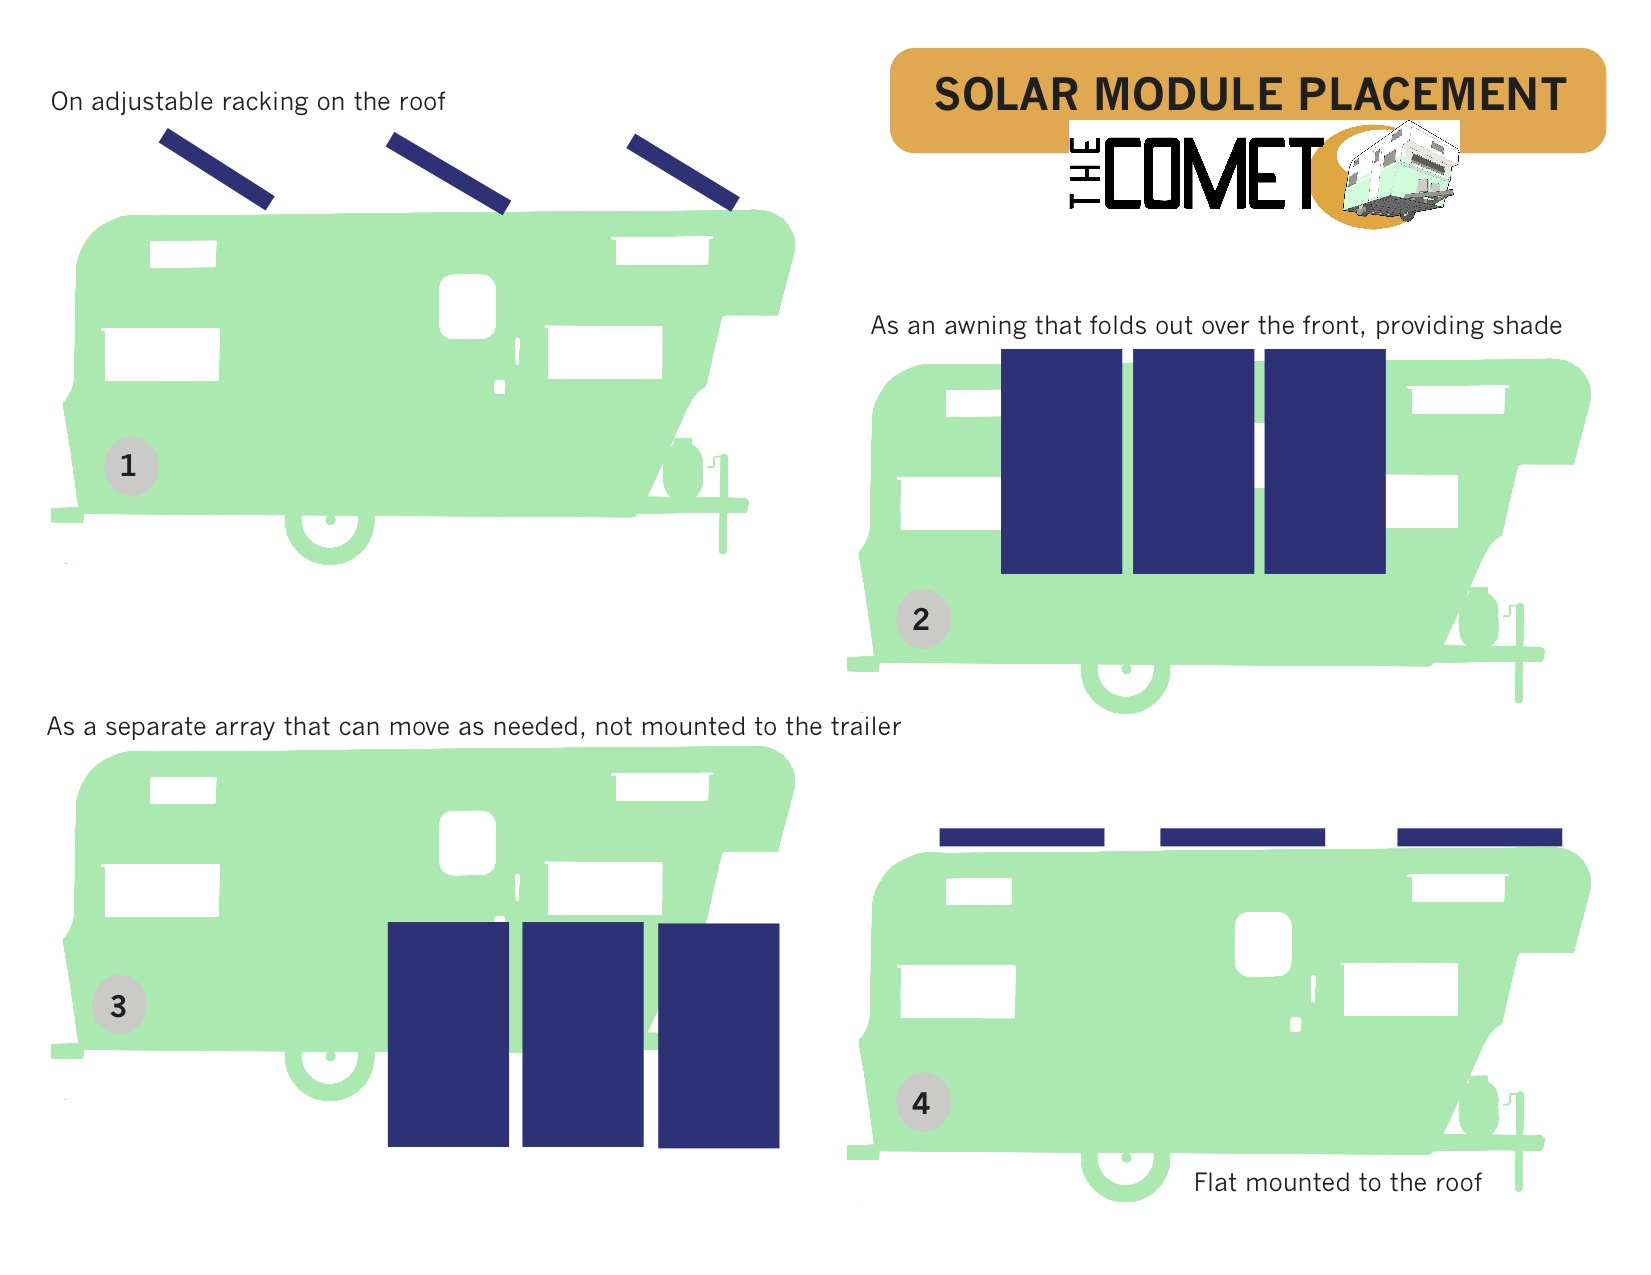 solar module placement infographic